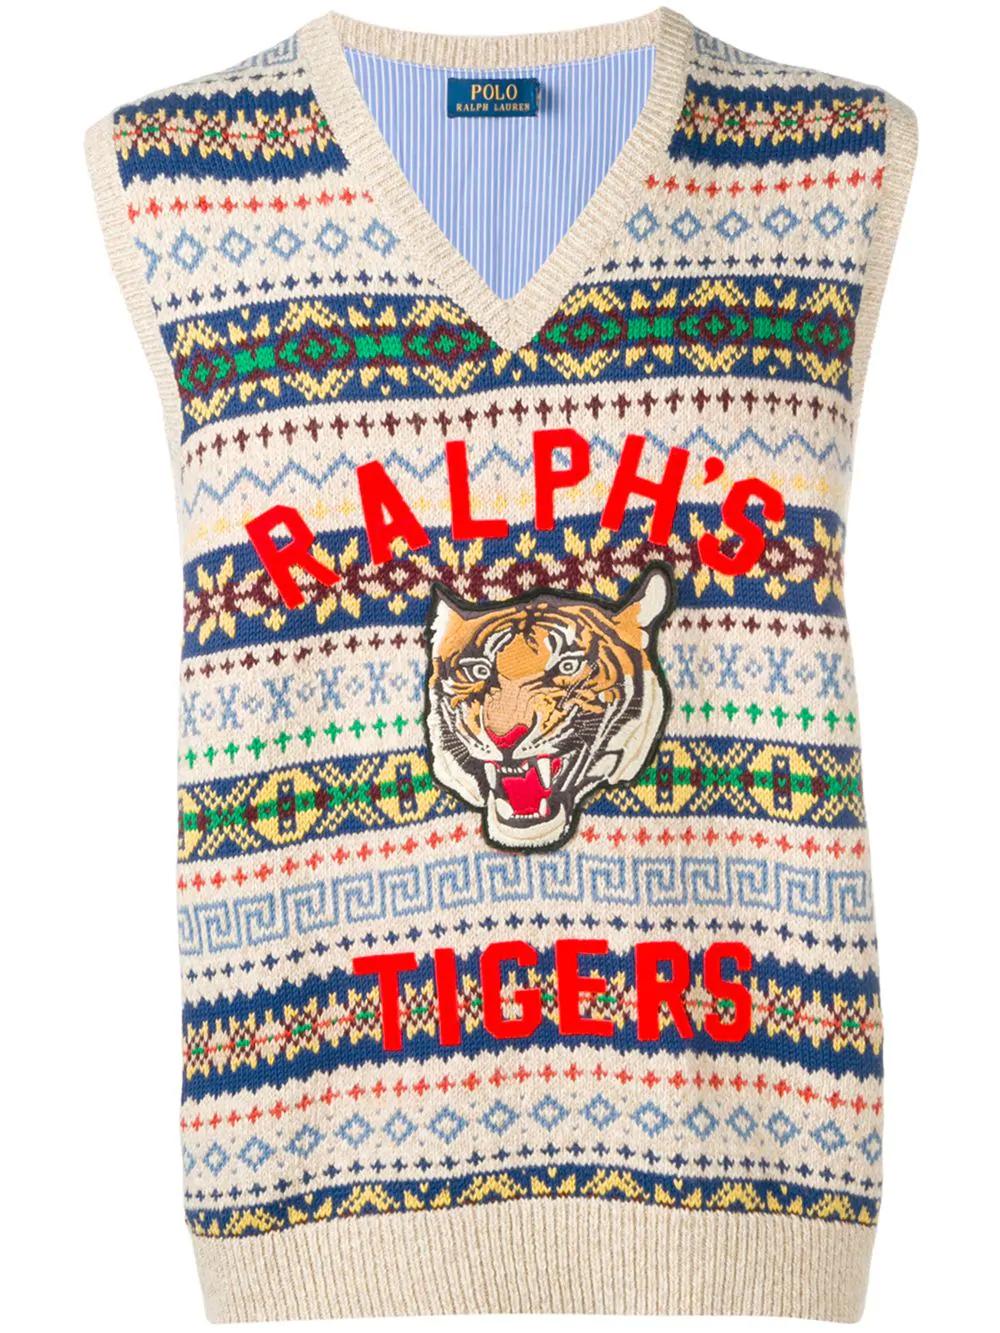 77f67a13 Polo Ralph Lauren 'Tigers' Pullunder - Nude In Neutrals | ModeSens